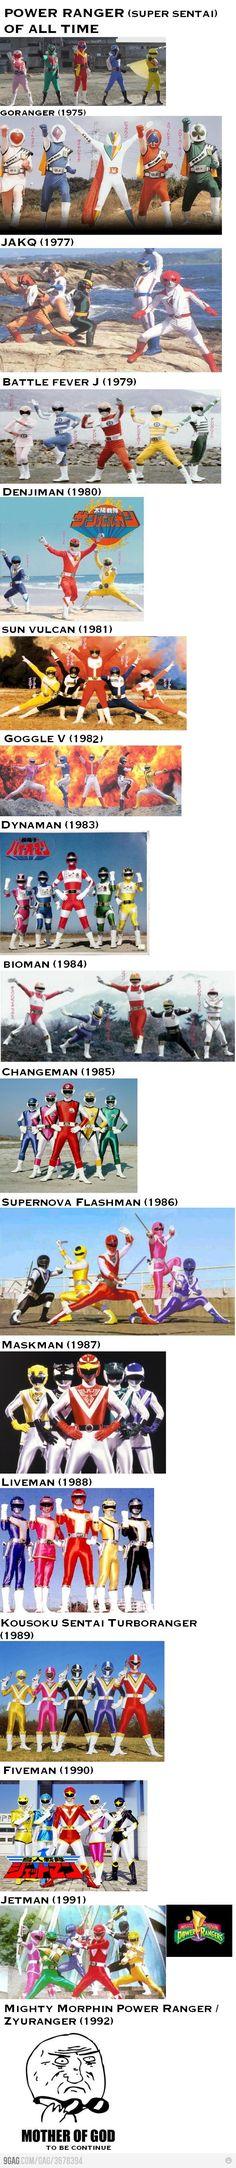 245 Best Super Sentai, Kaiju, Robots & More images in 2015